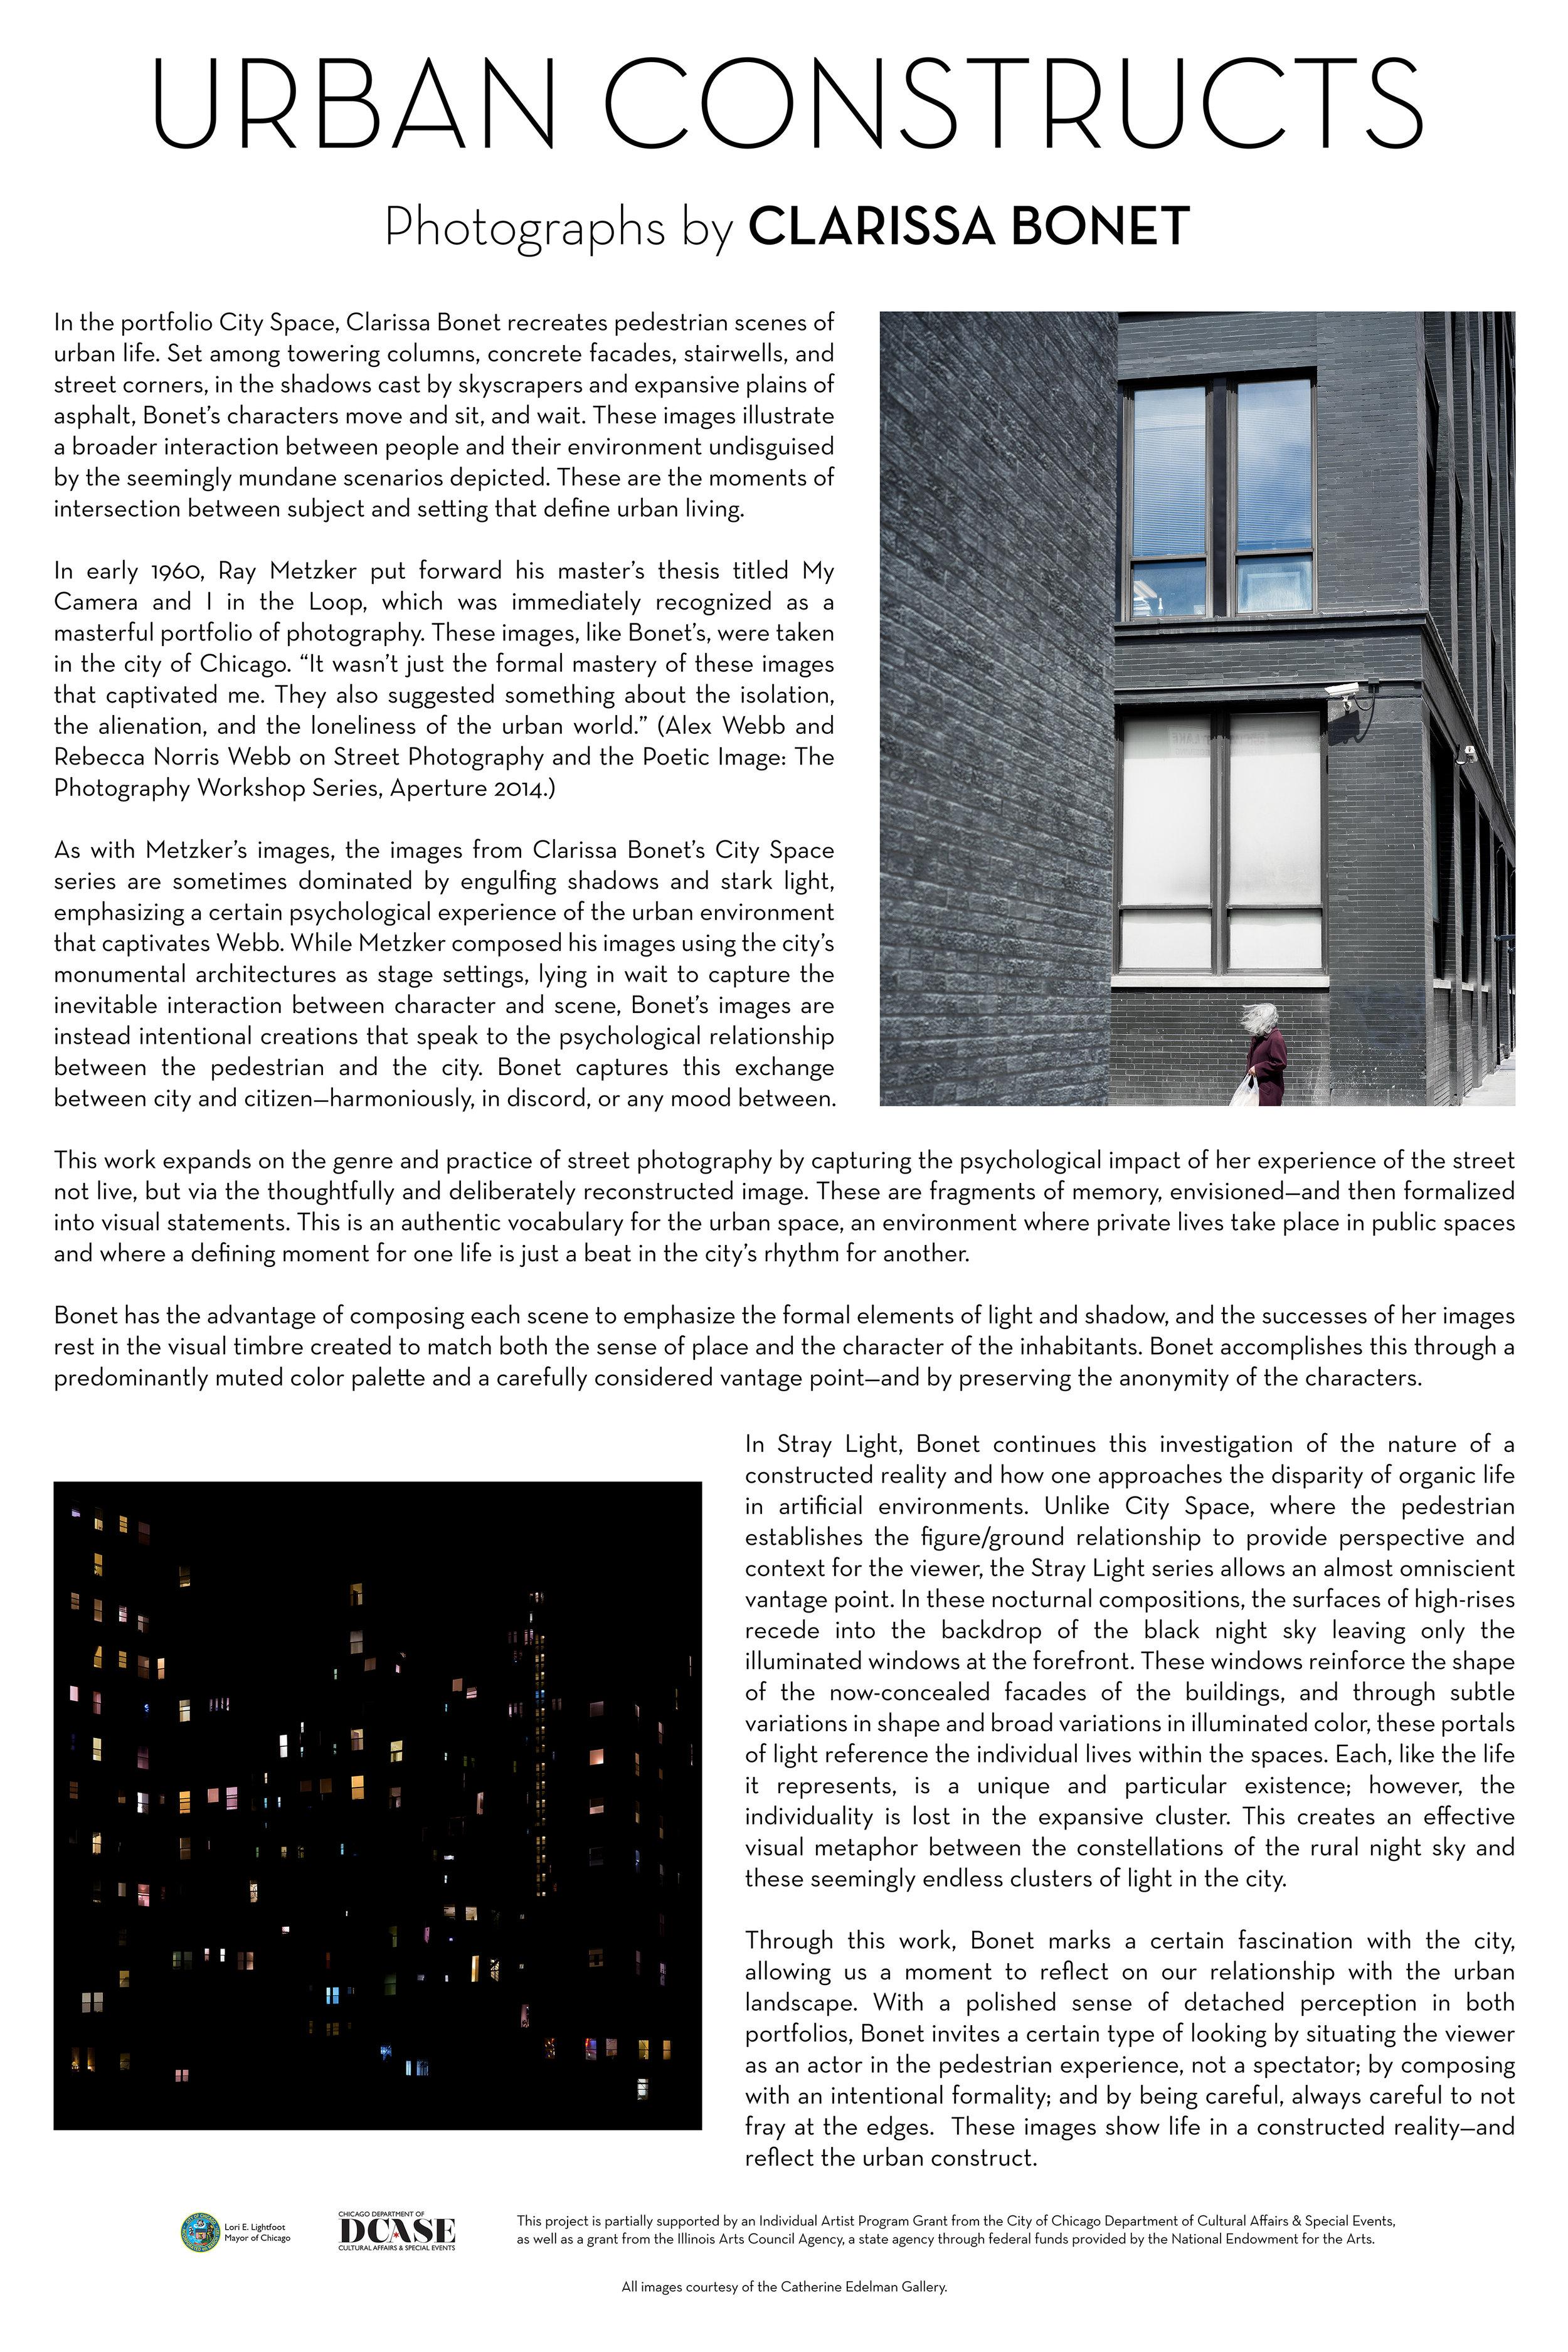 UrbanConstructs_Text Panel-3 small.jpg